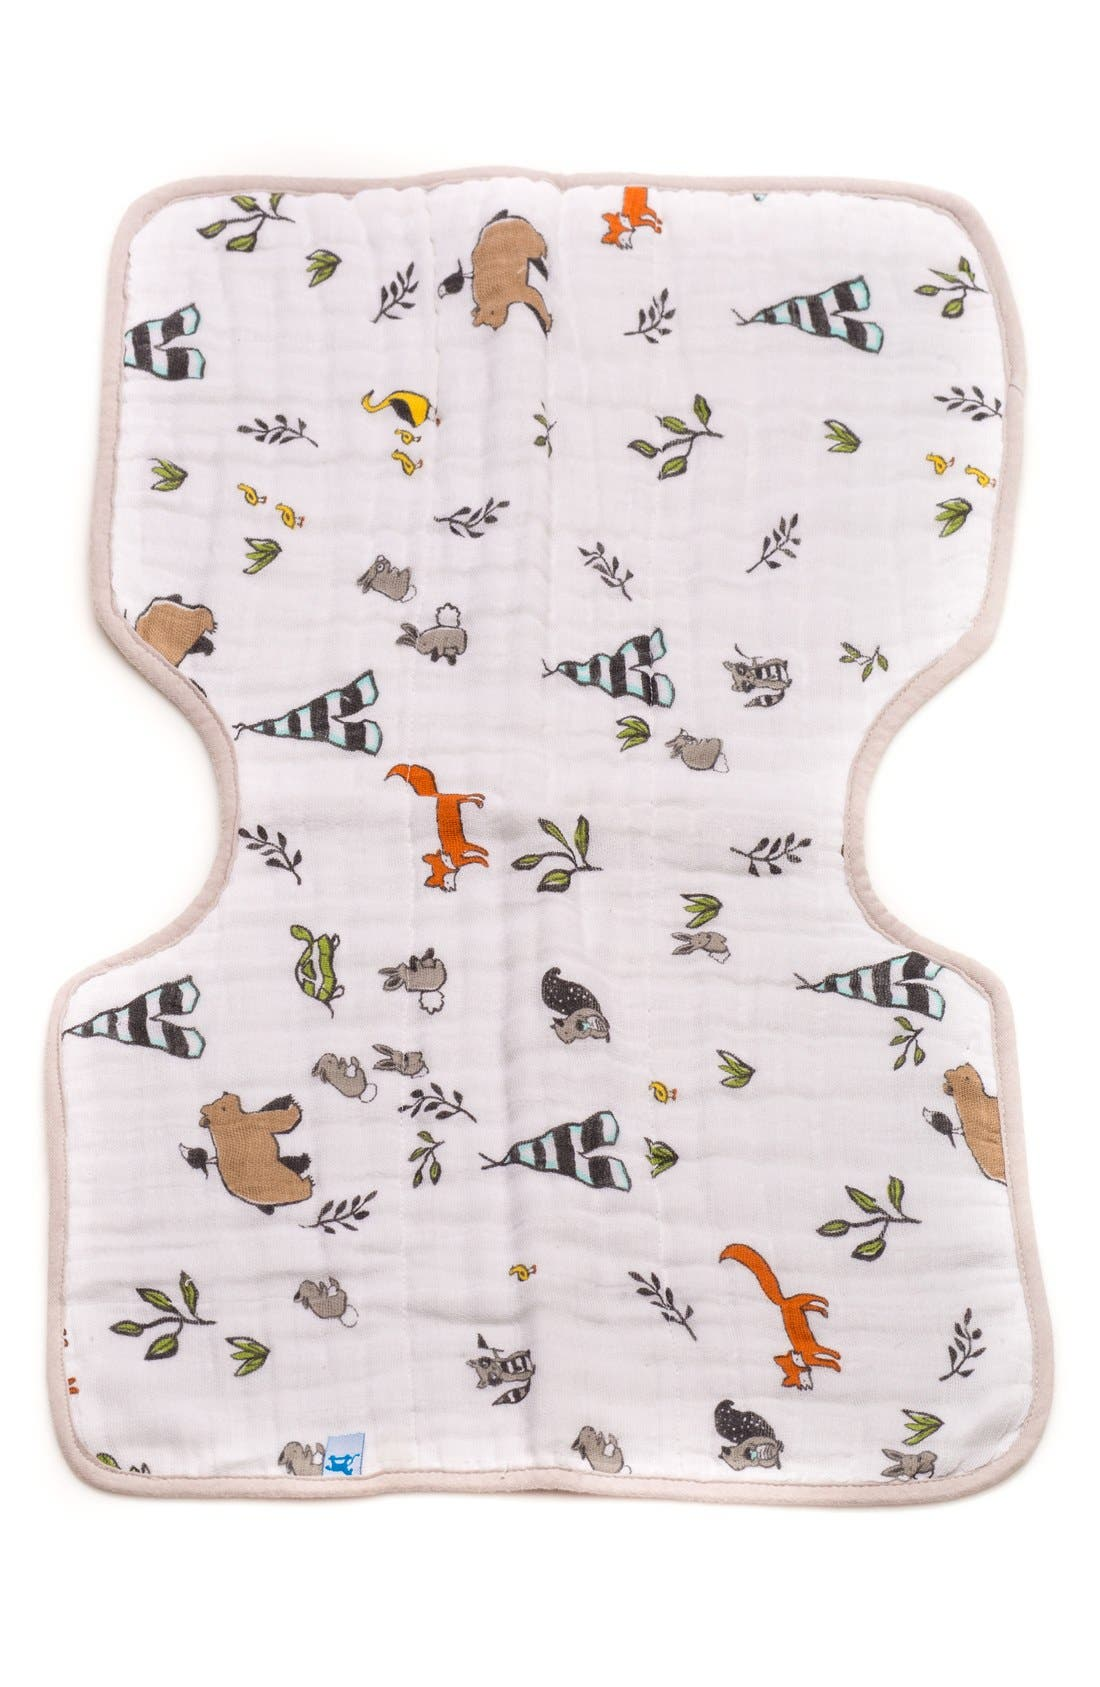 Main Image - little unicorn Cotton Muslin Burp Cloth